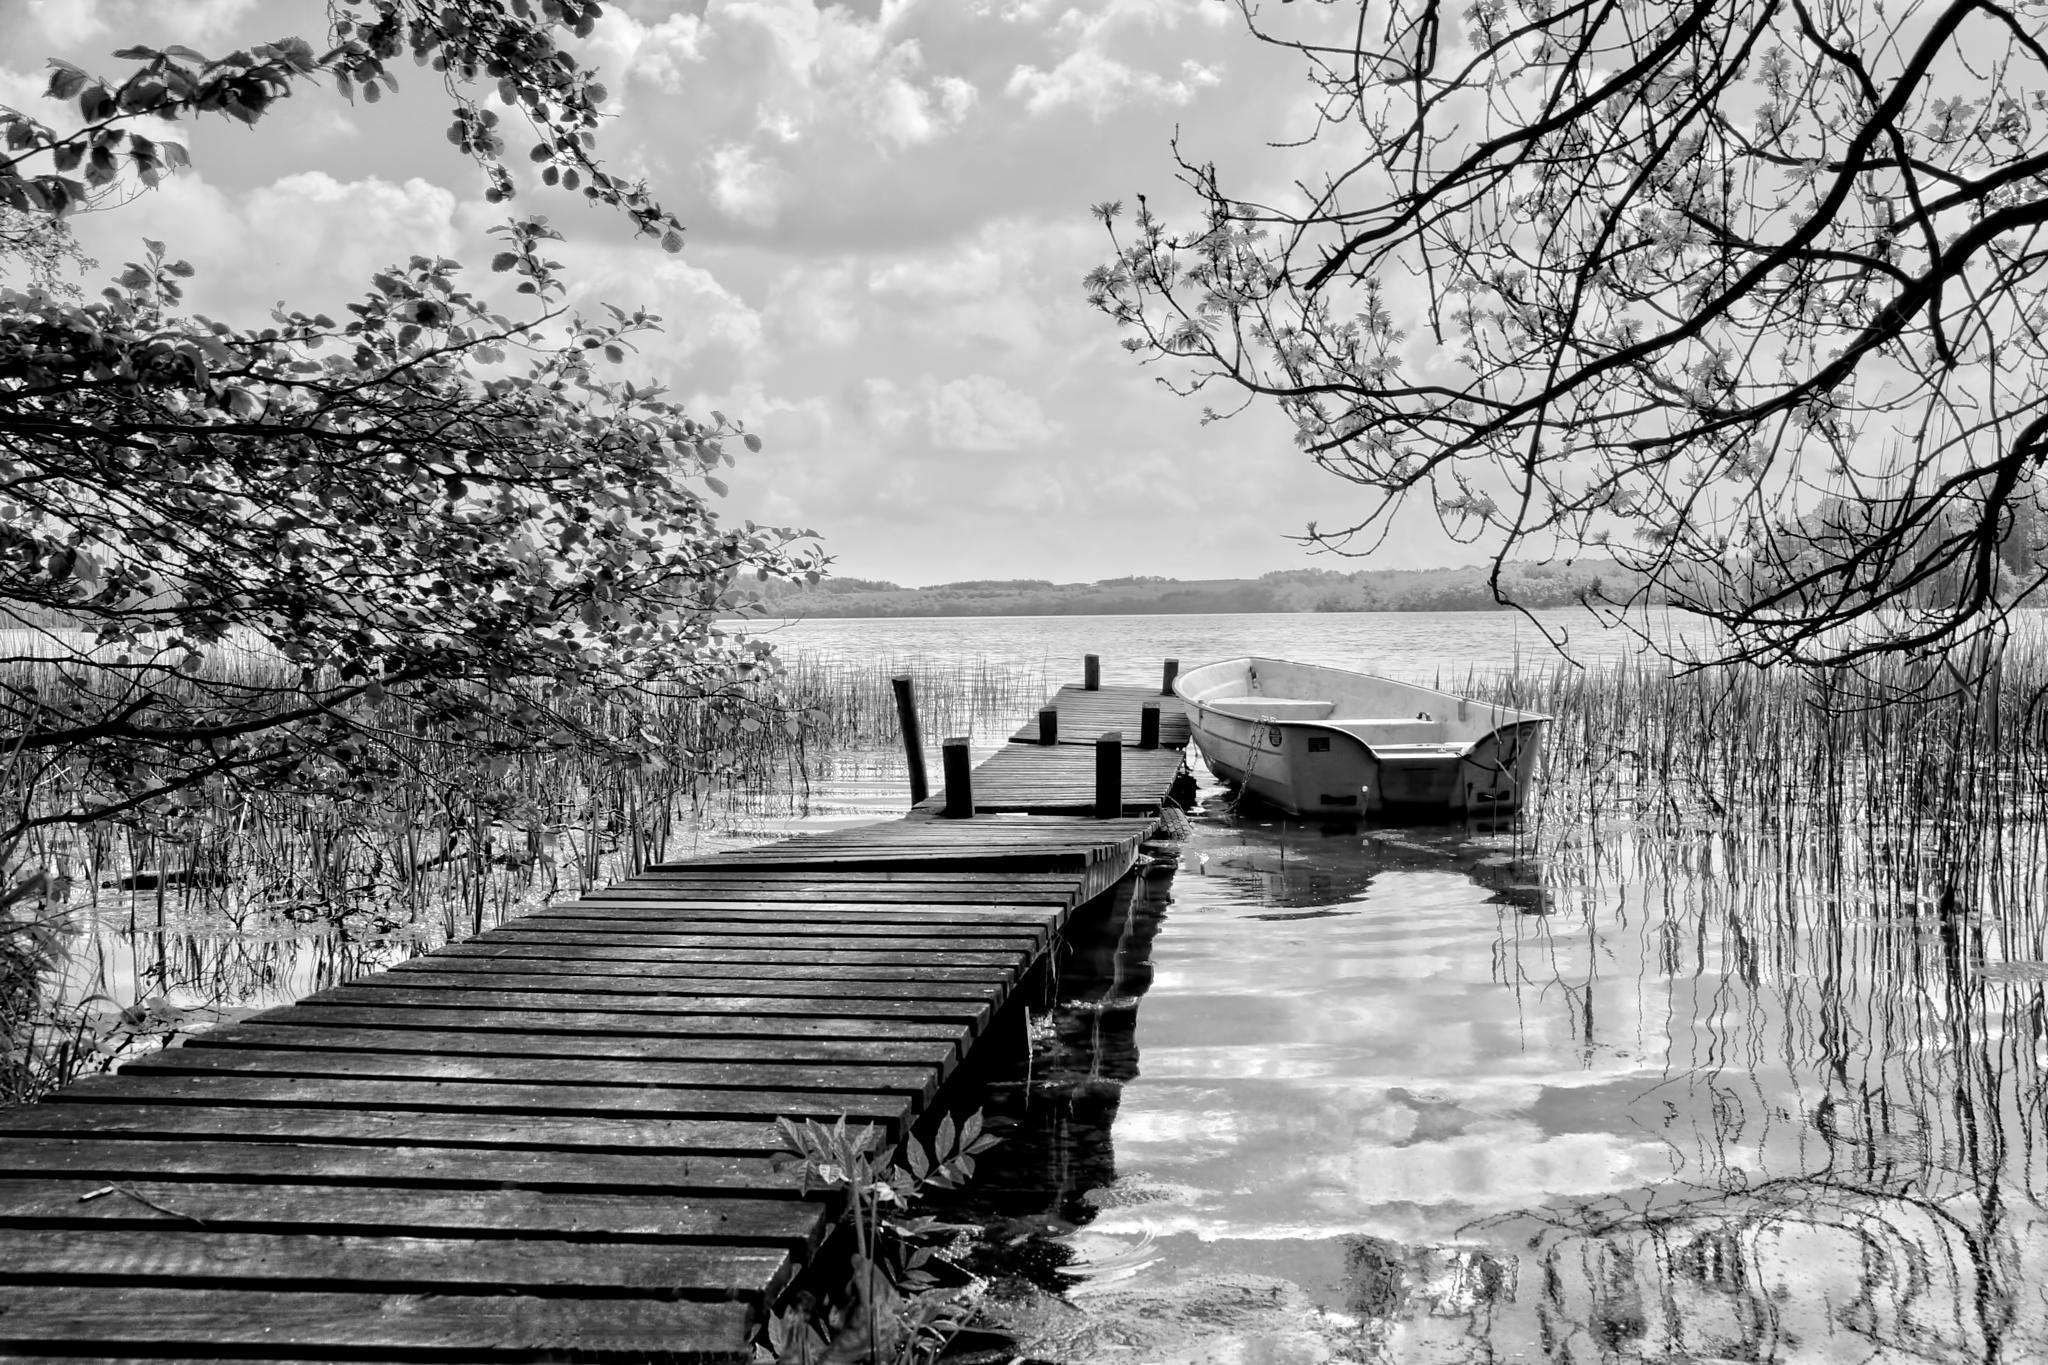 at the lake by PoulErikVistoftNielsen